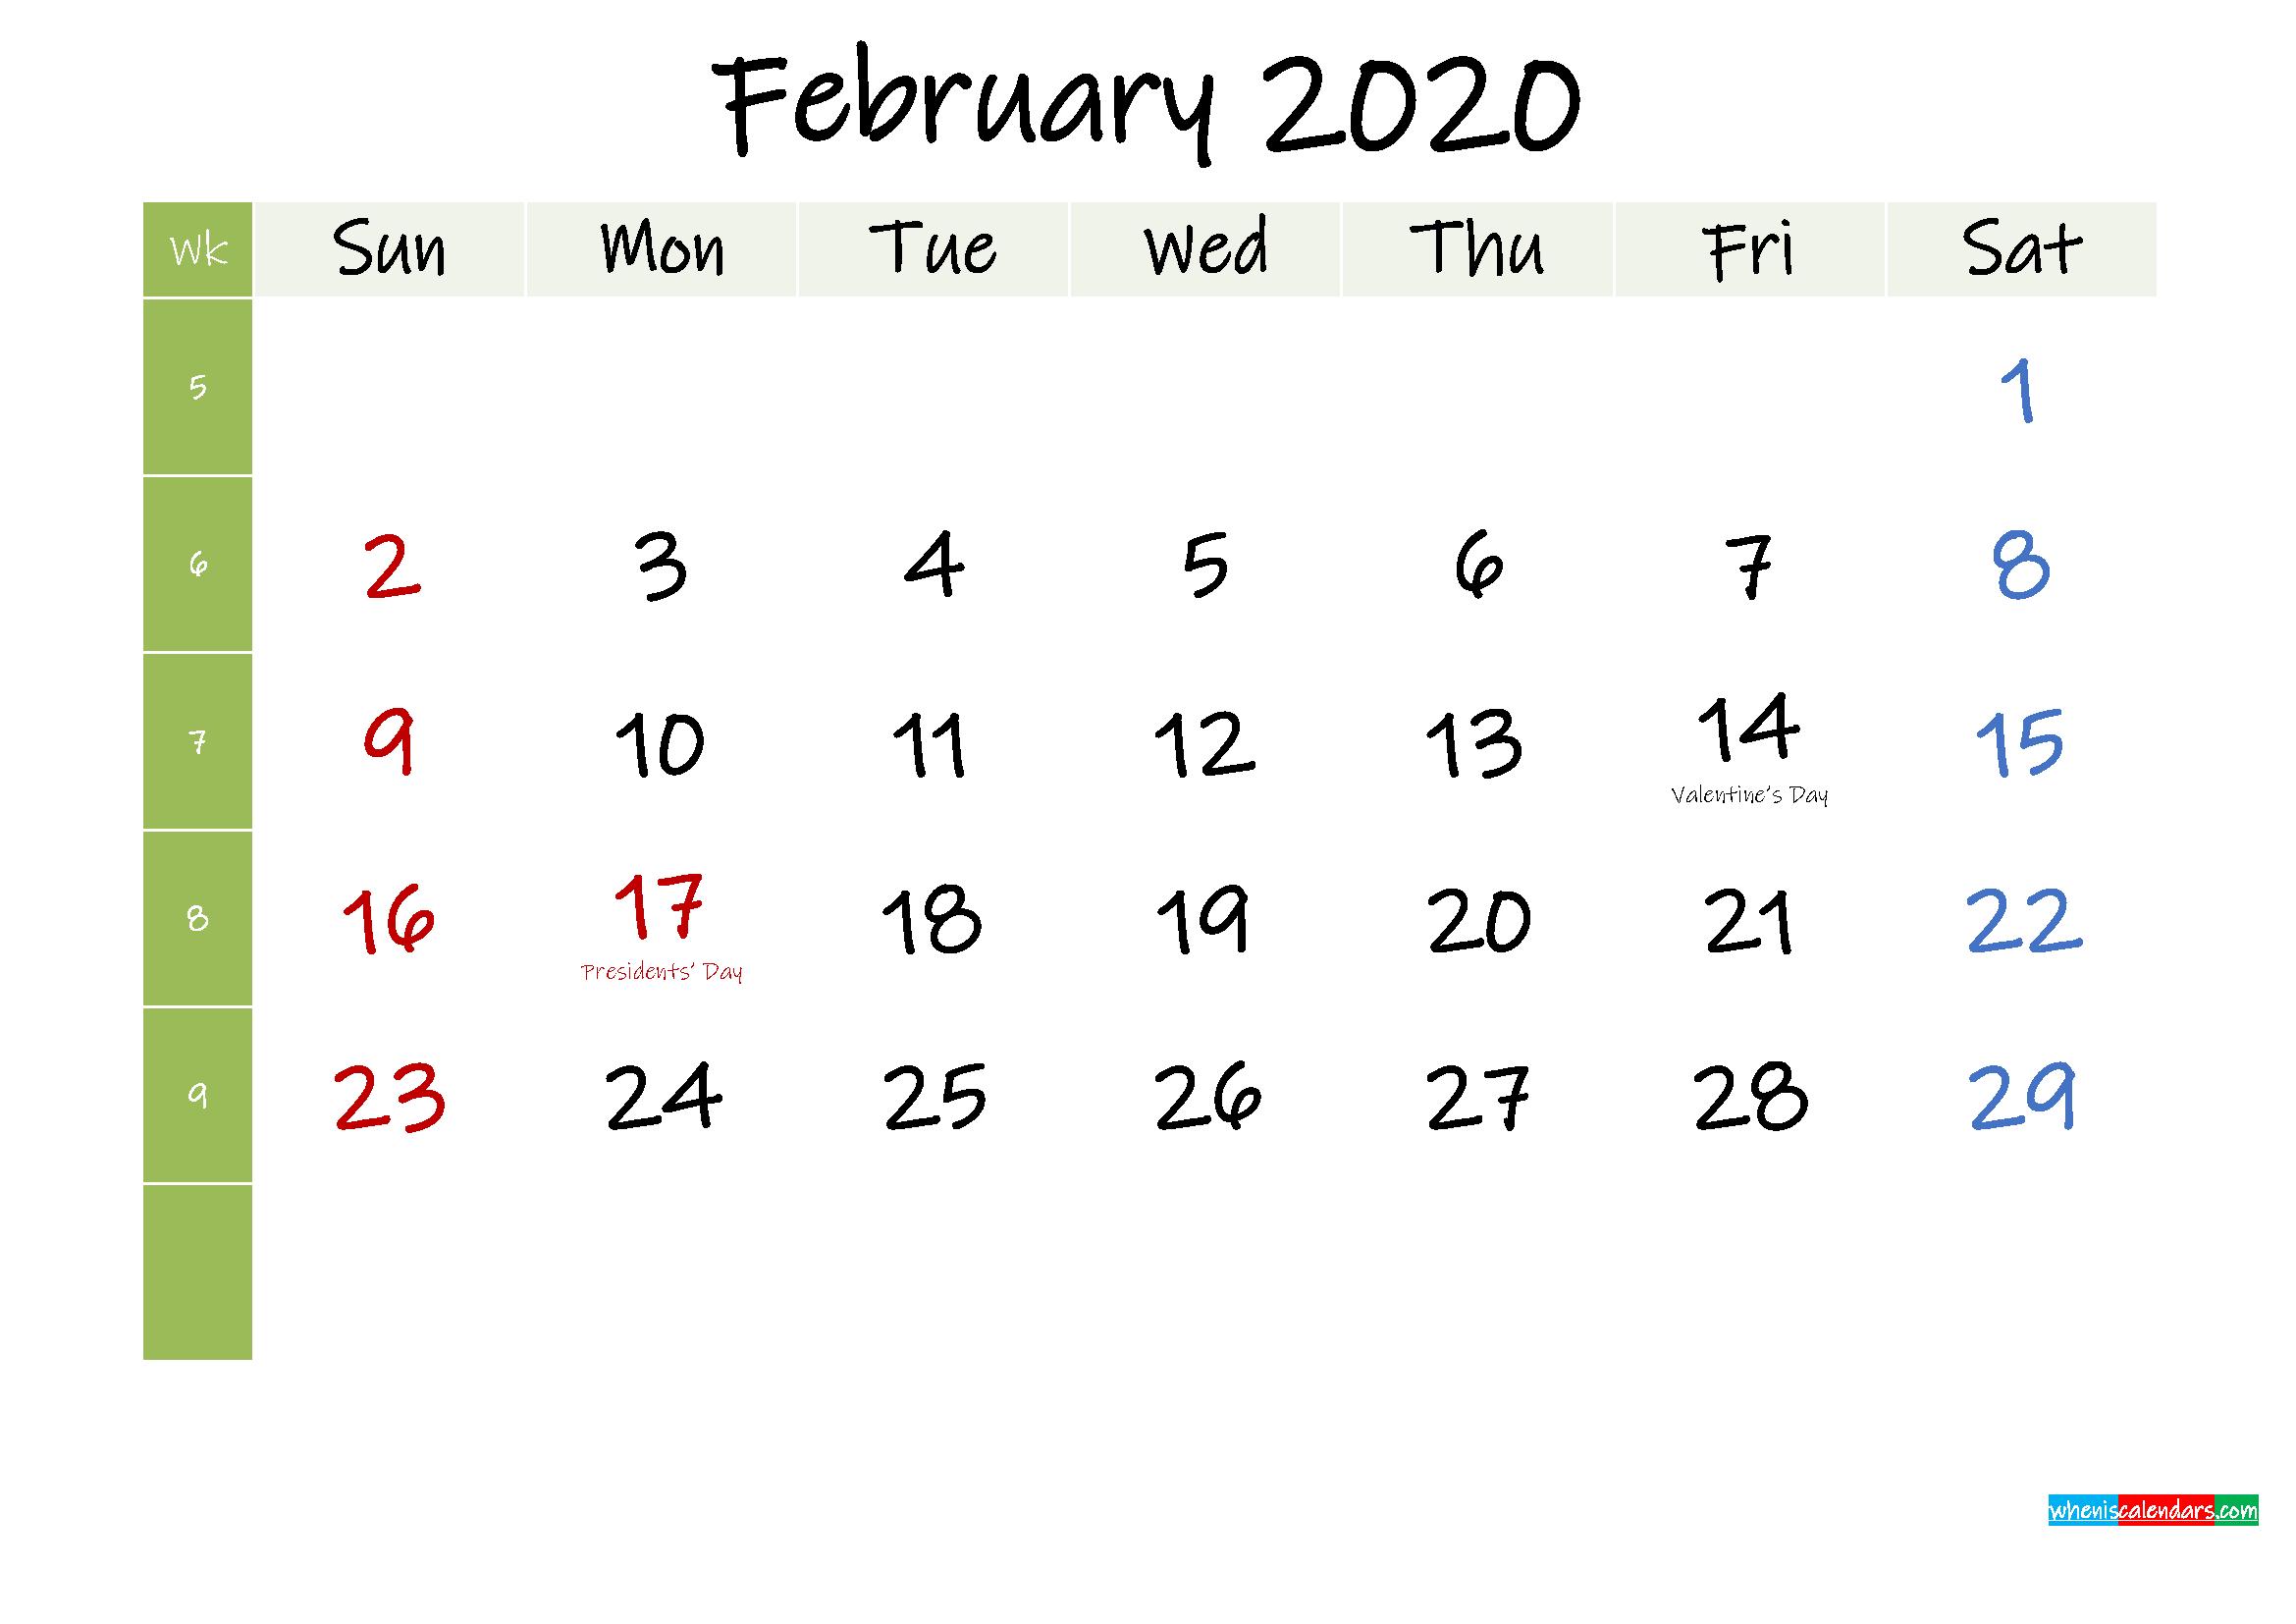 Free February 2020 Printable Calendar with Holidays